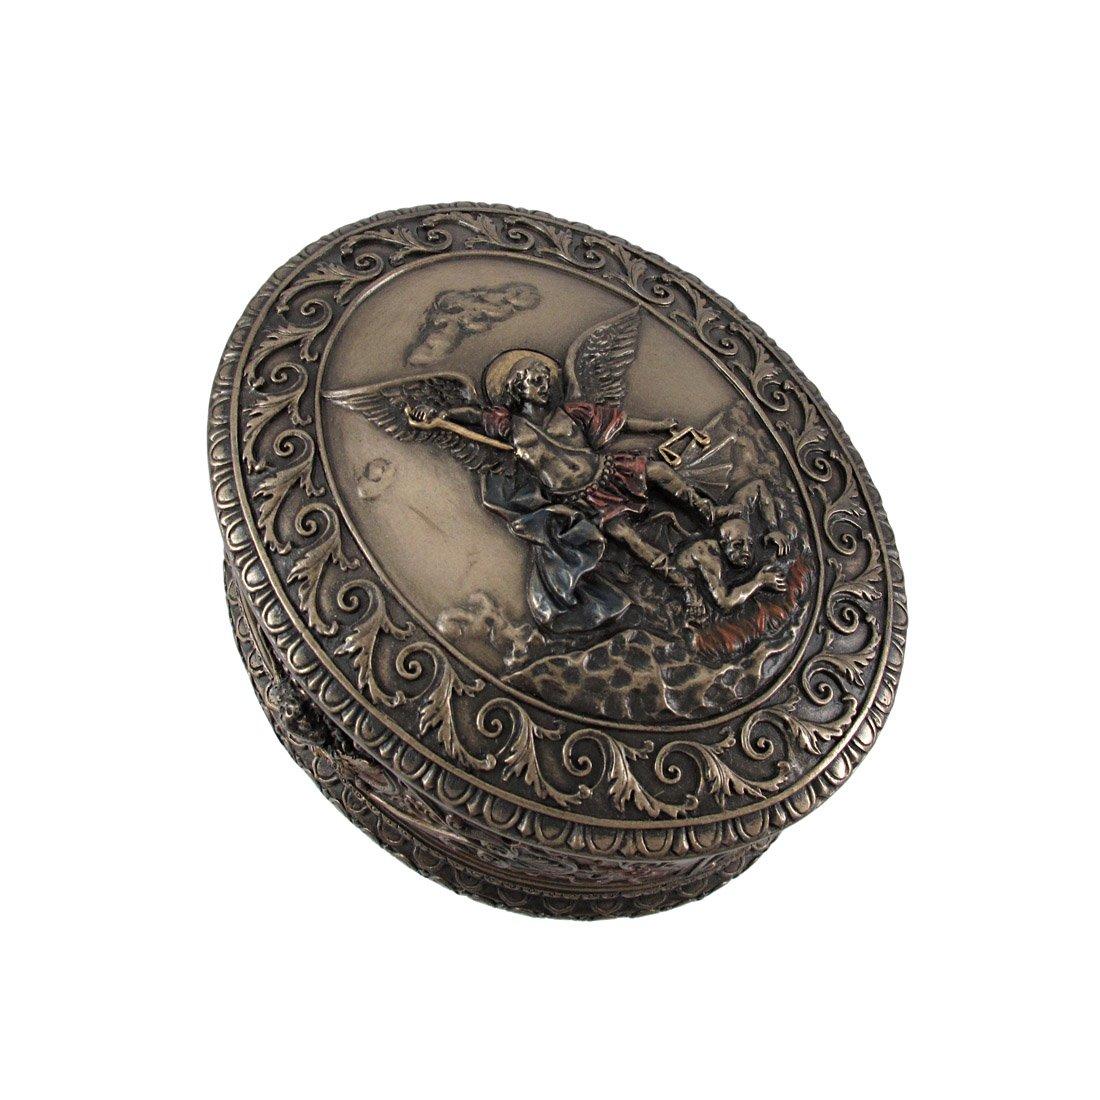 Michael Bas Relief Oval Trinket Box USI Veronese Ornate Bronze St